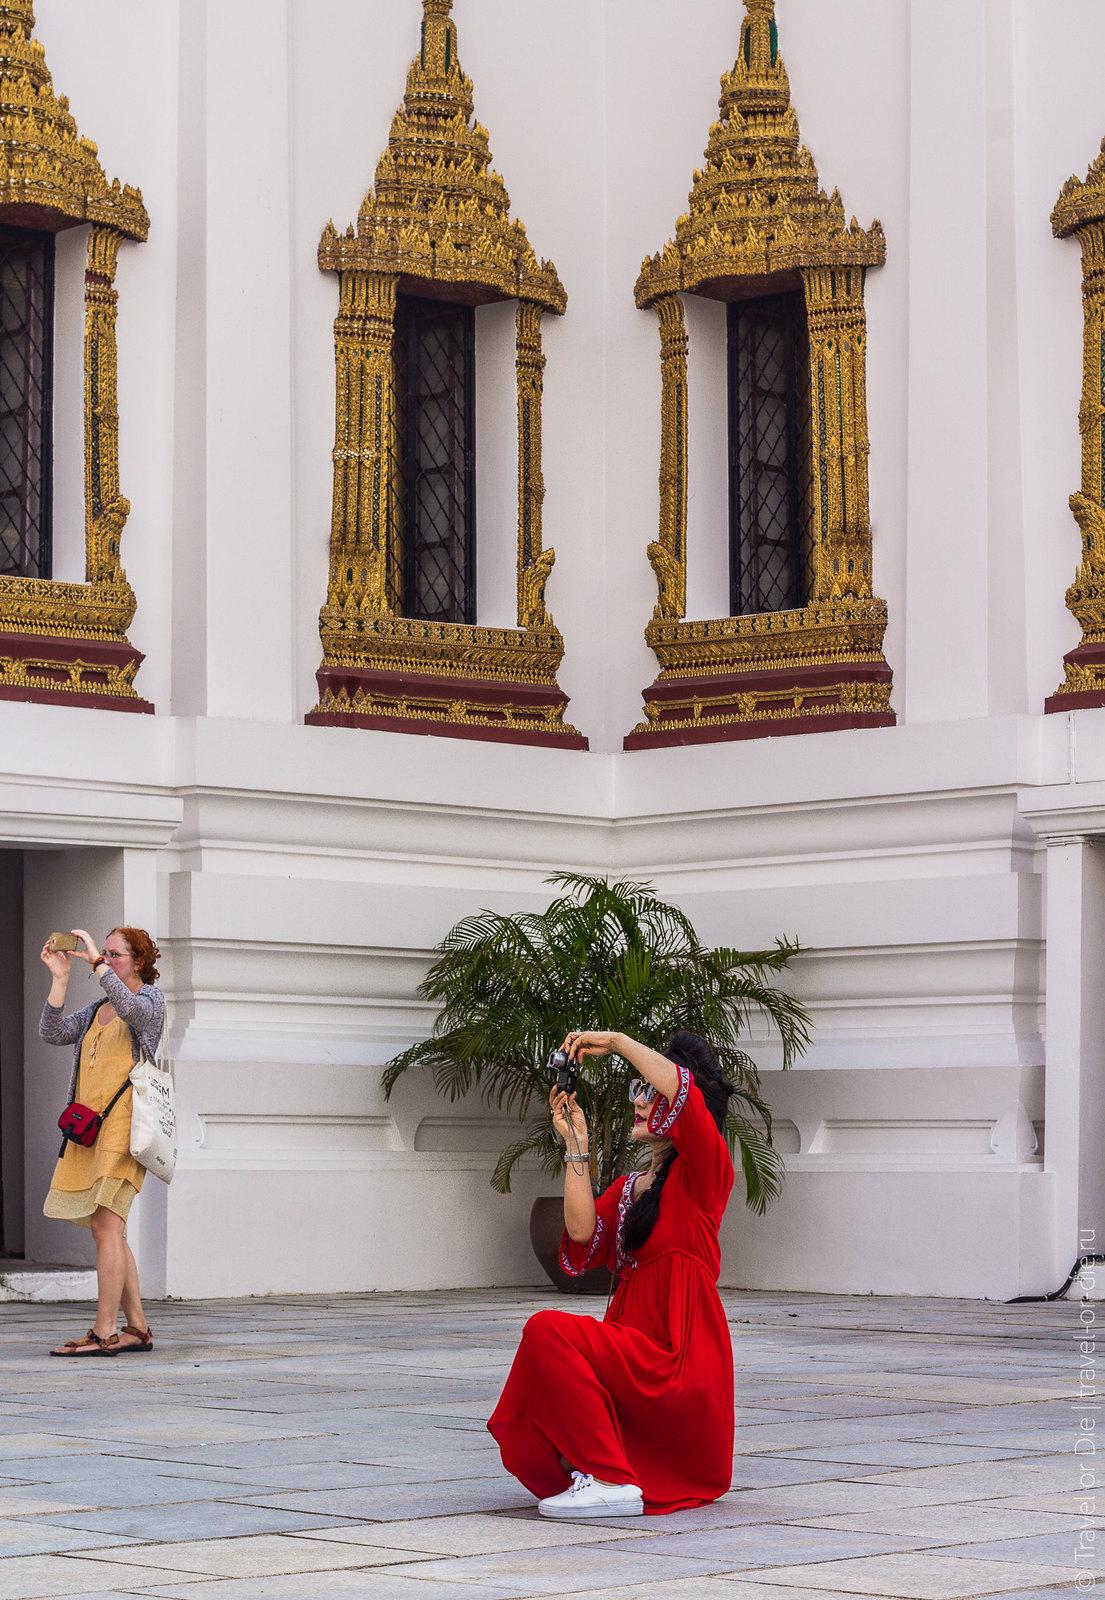 Grand-Palace-Bangkok-Королевский-дворец-Бангкок-9317